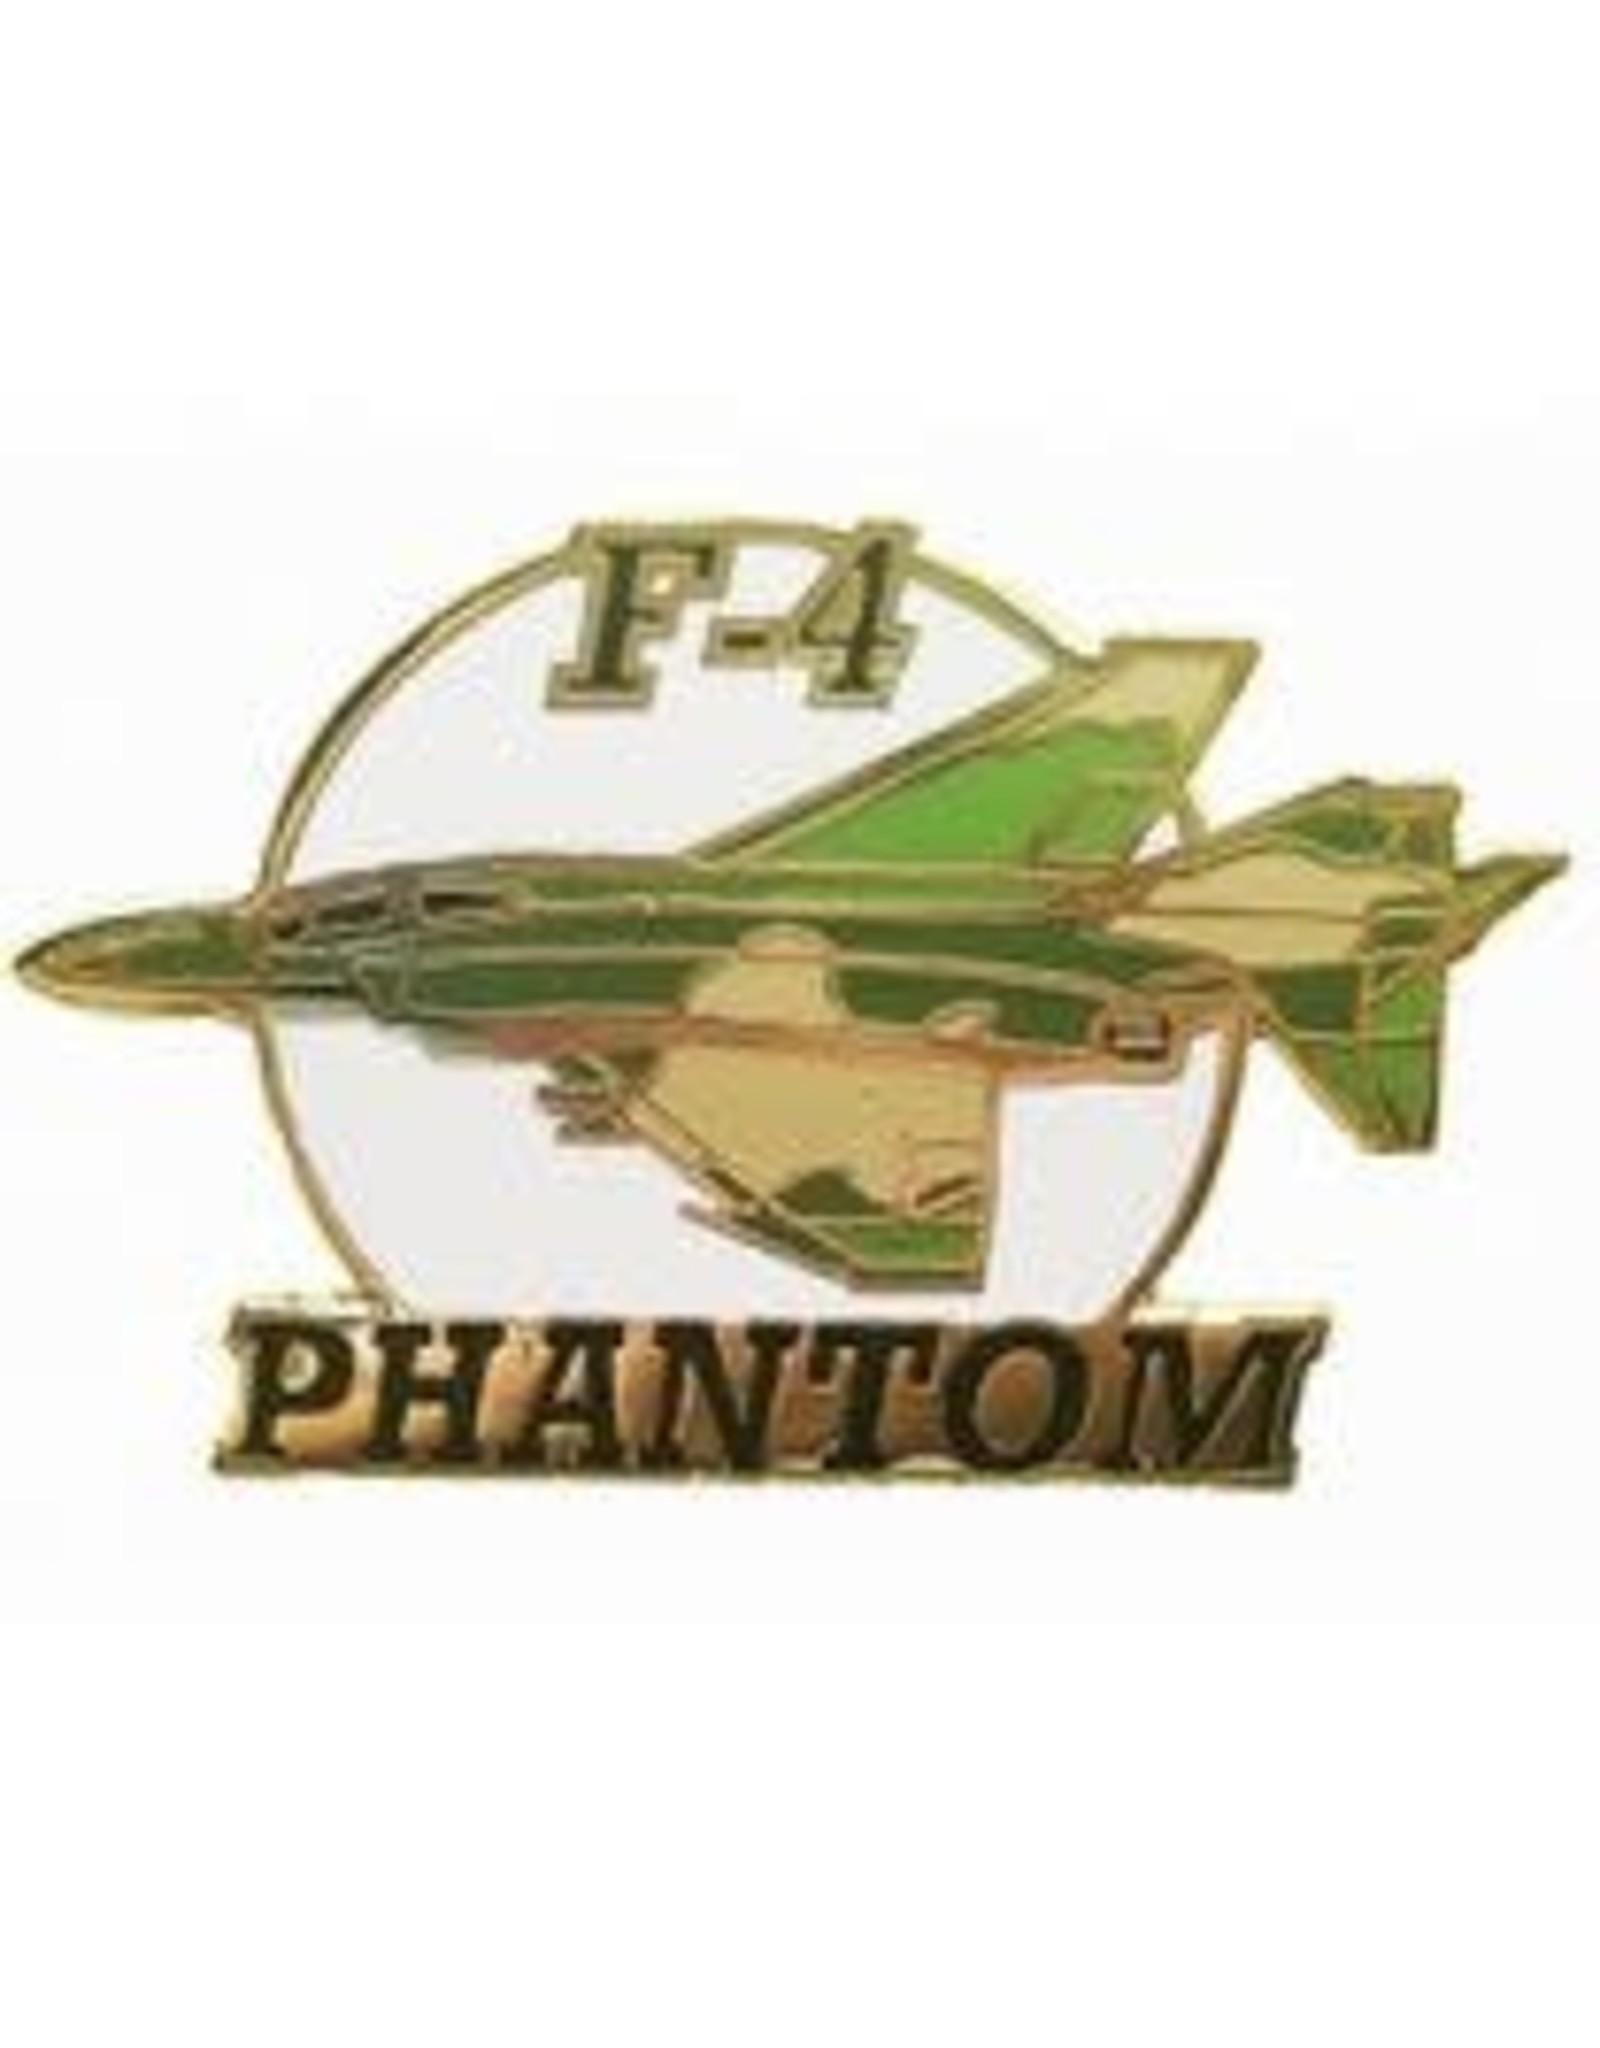 Pin - Airplane F-004 Phantom